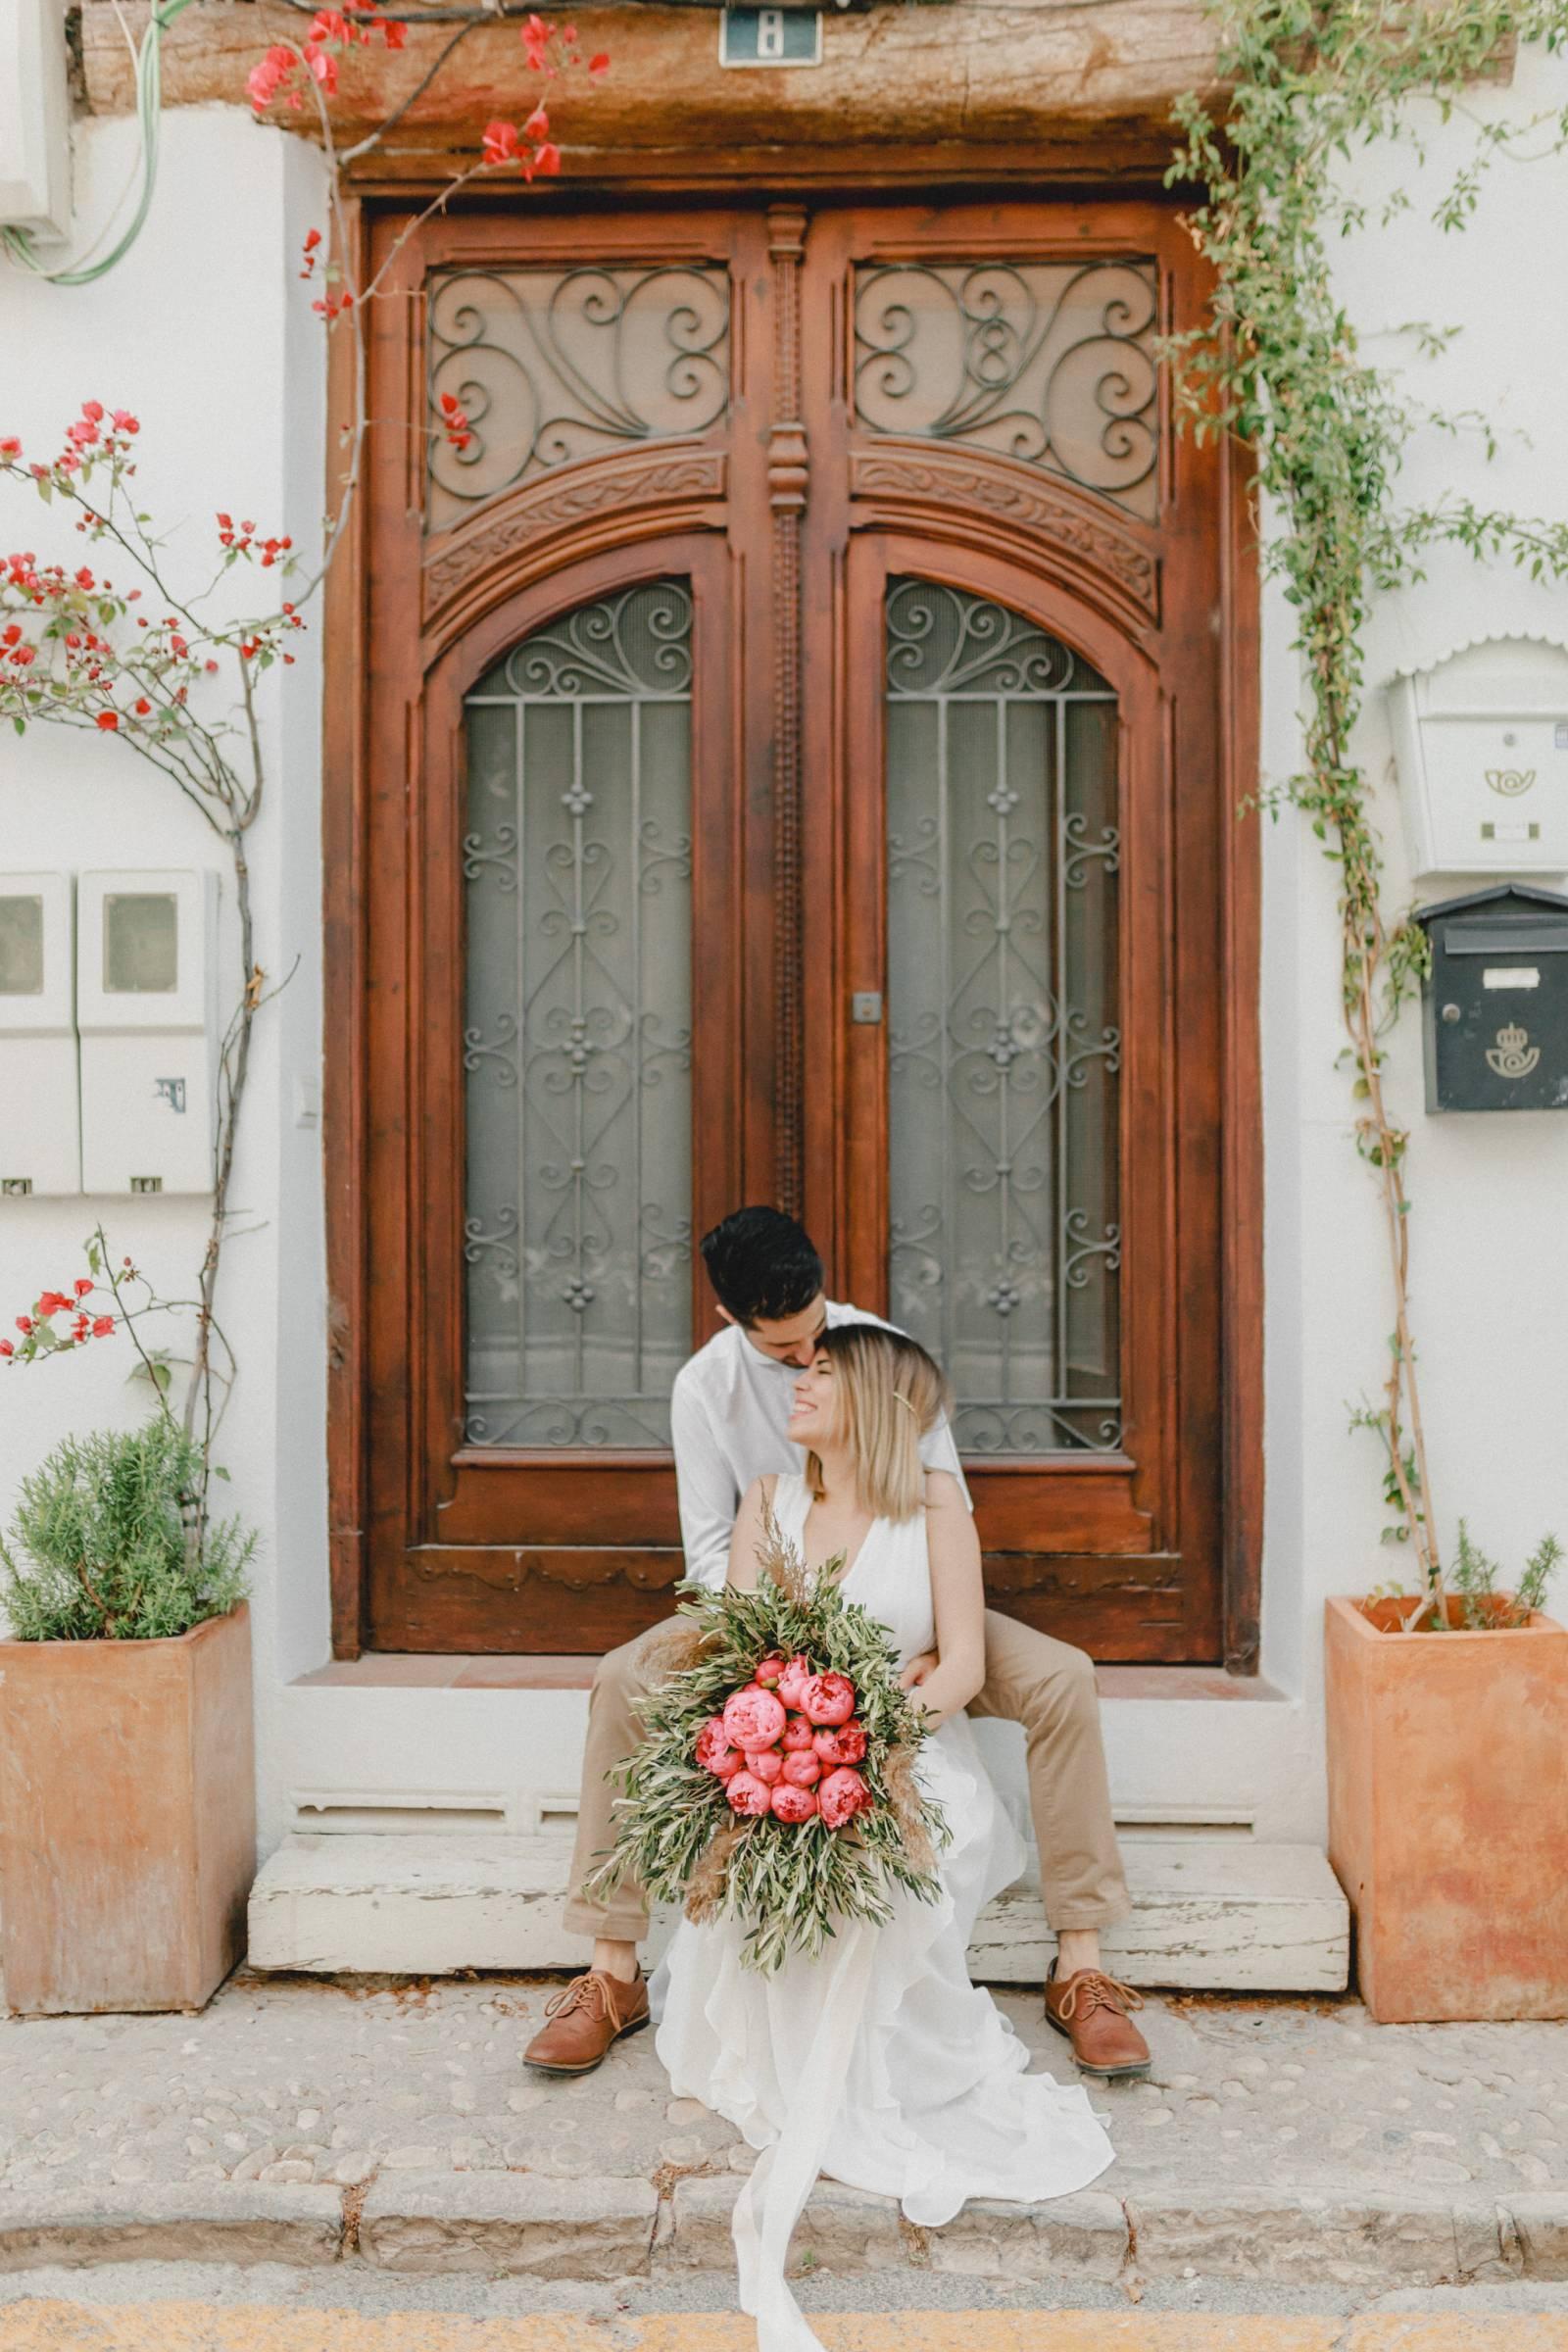 Pastel sunset couples shoot in Spain   Spain Couples portraits